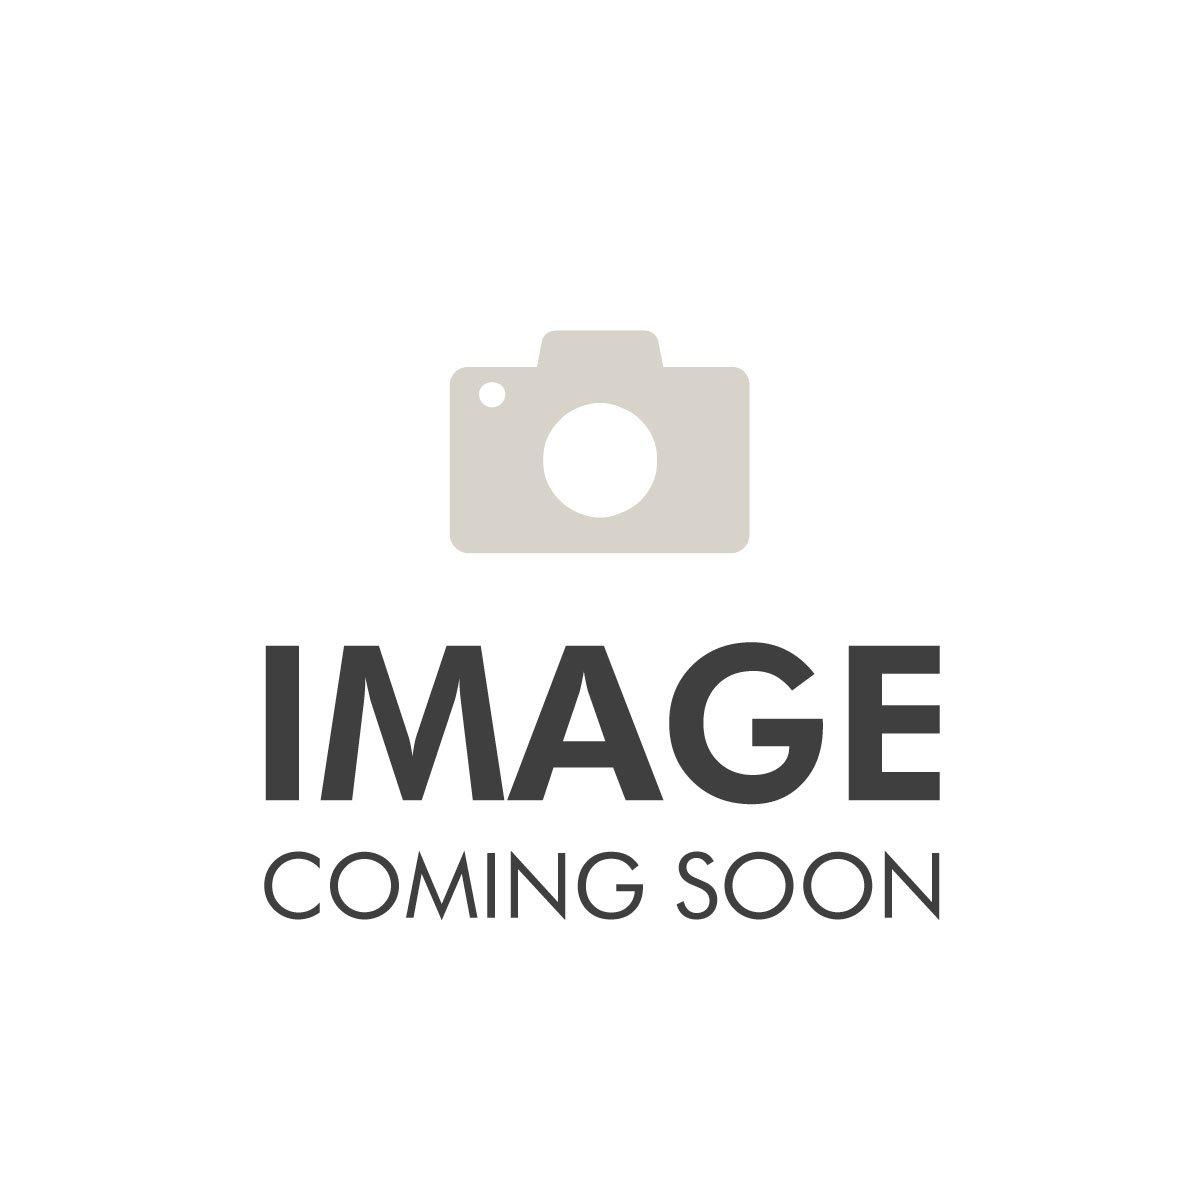 Revlon Colorsilk Ammonia Free 74 Medium Blond